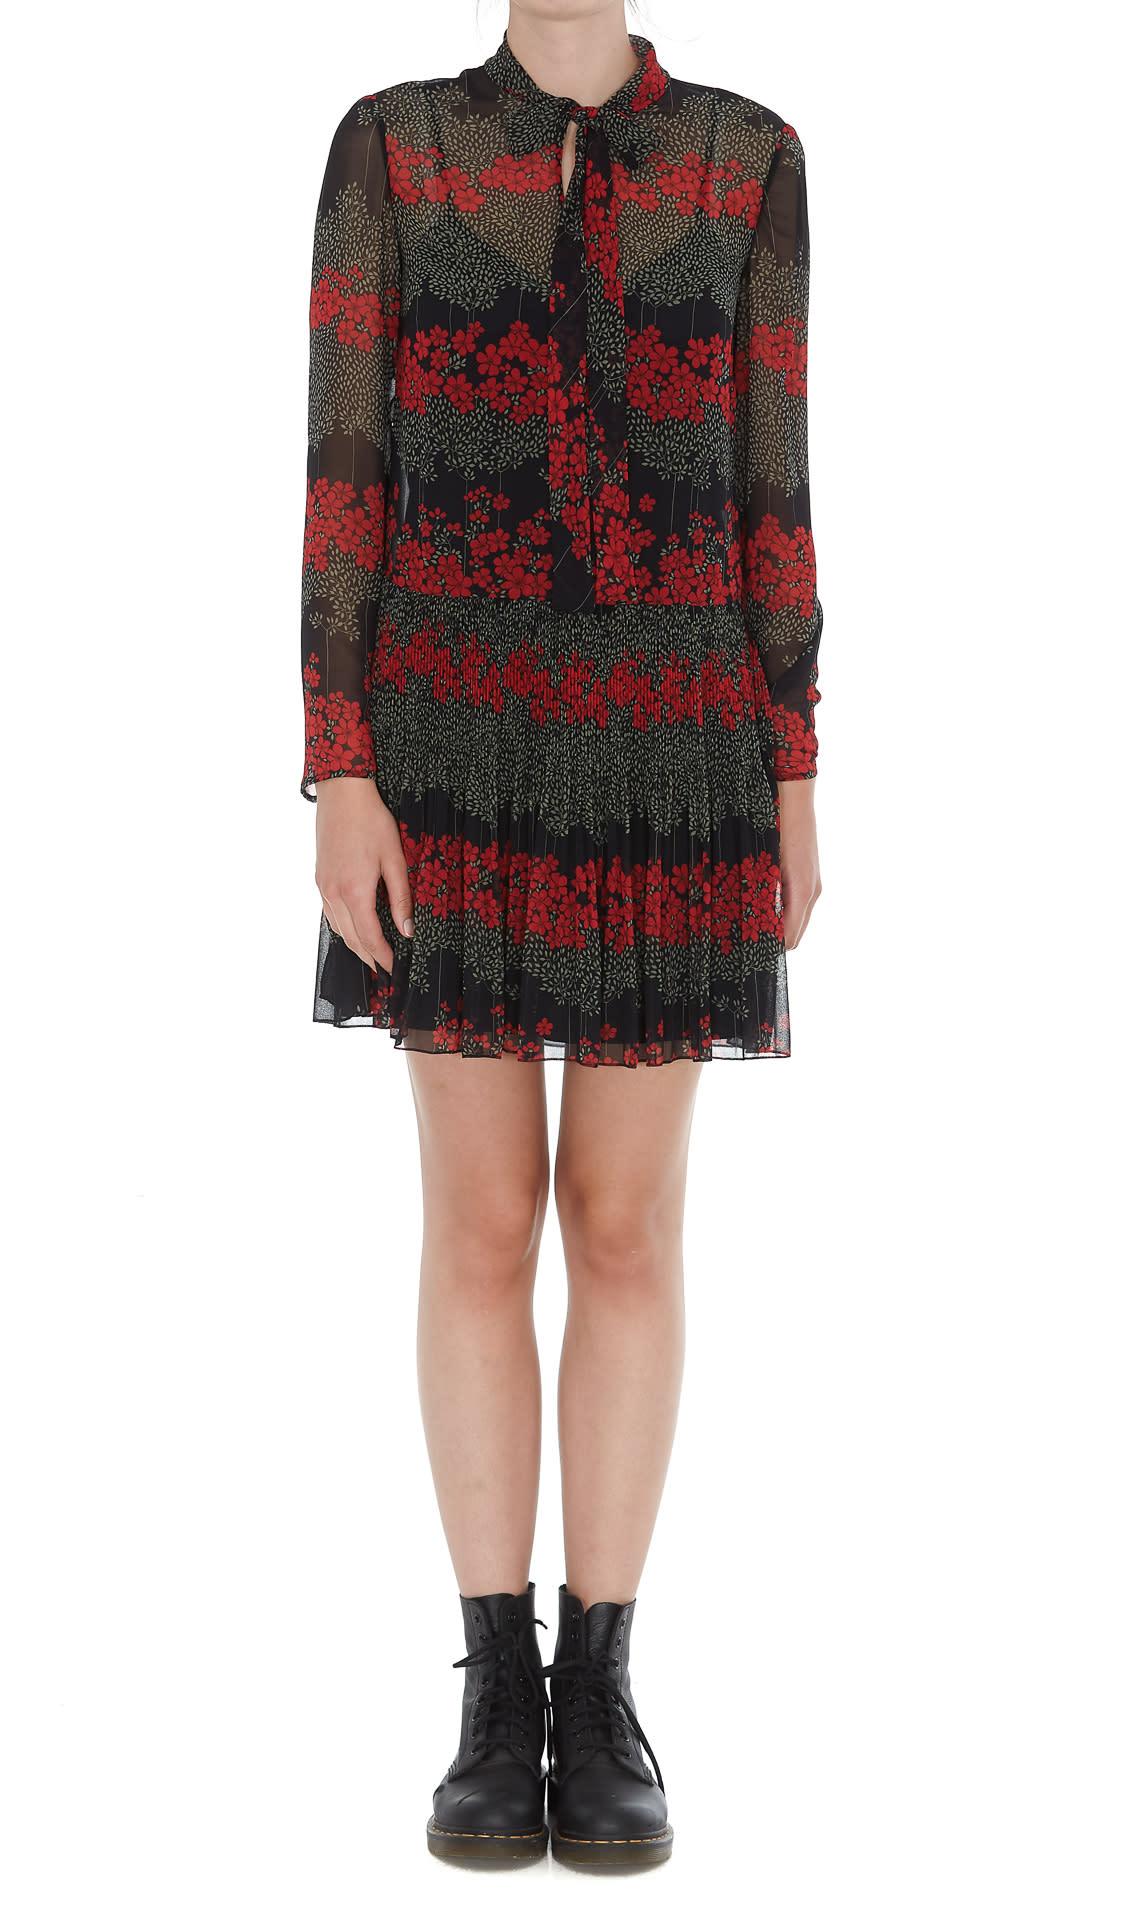 Red Valentino Dreaming Peony Print Mini Dress